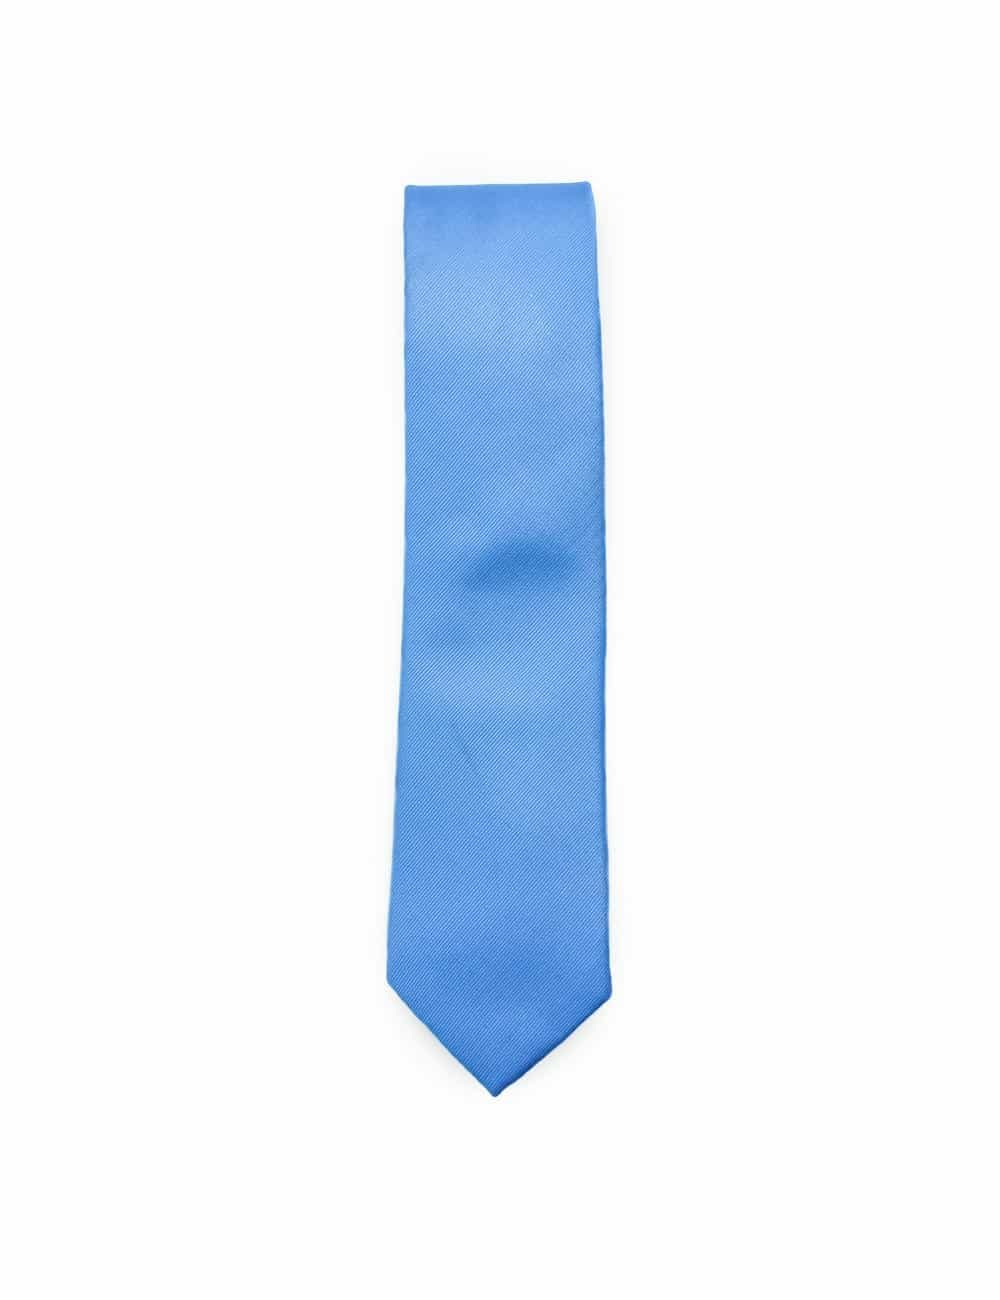 Solid Diver Blue Woven Necktie NT13.7